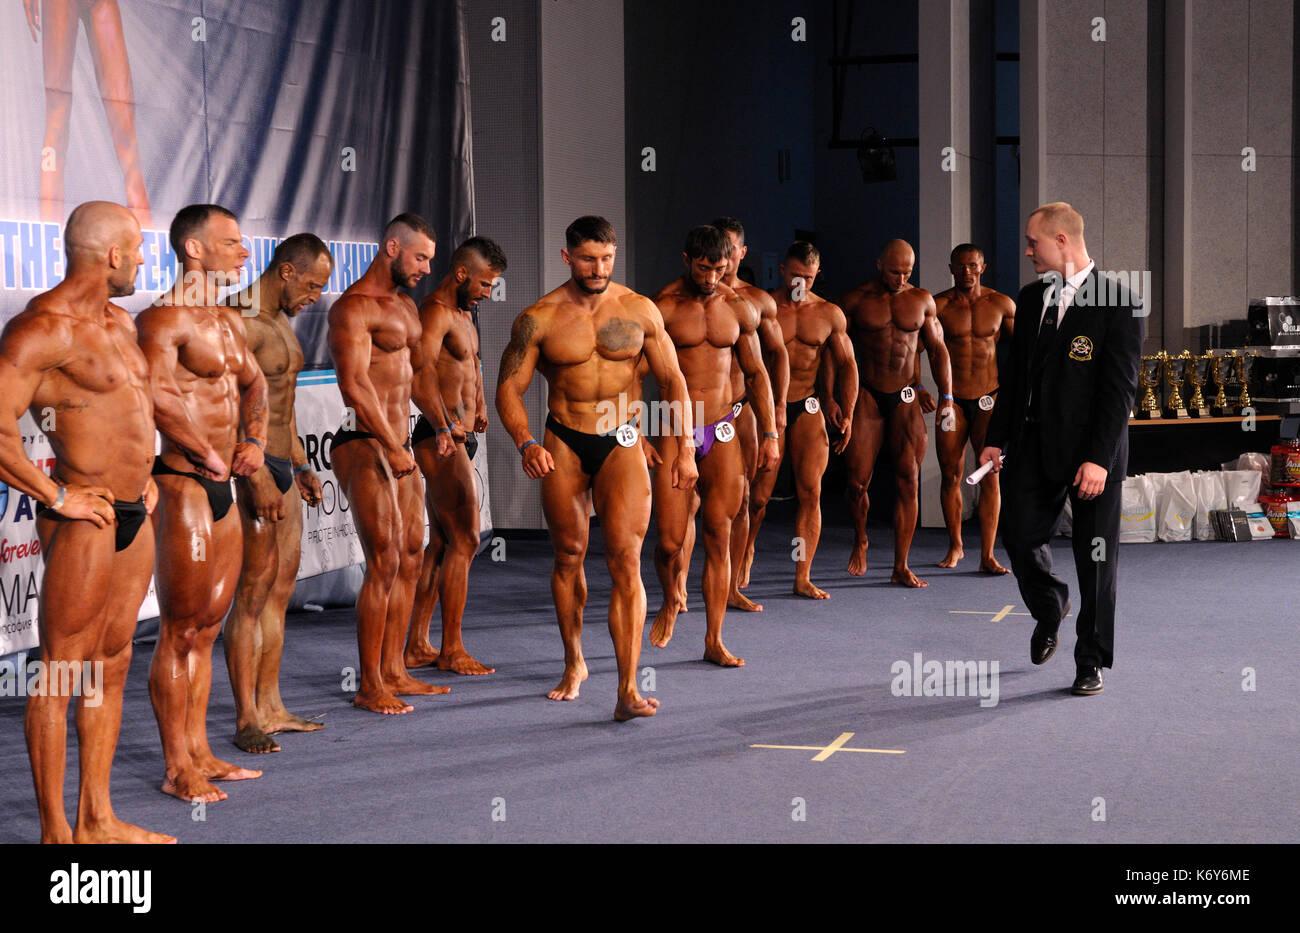 Kiev Cup 2016: Bodybuilding, fitness, bikini. Ottobre 16, 2016. Kiev, Ucraina. Gli uomini. Immagini Stock